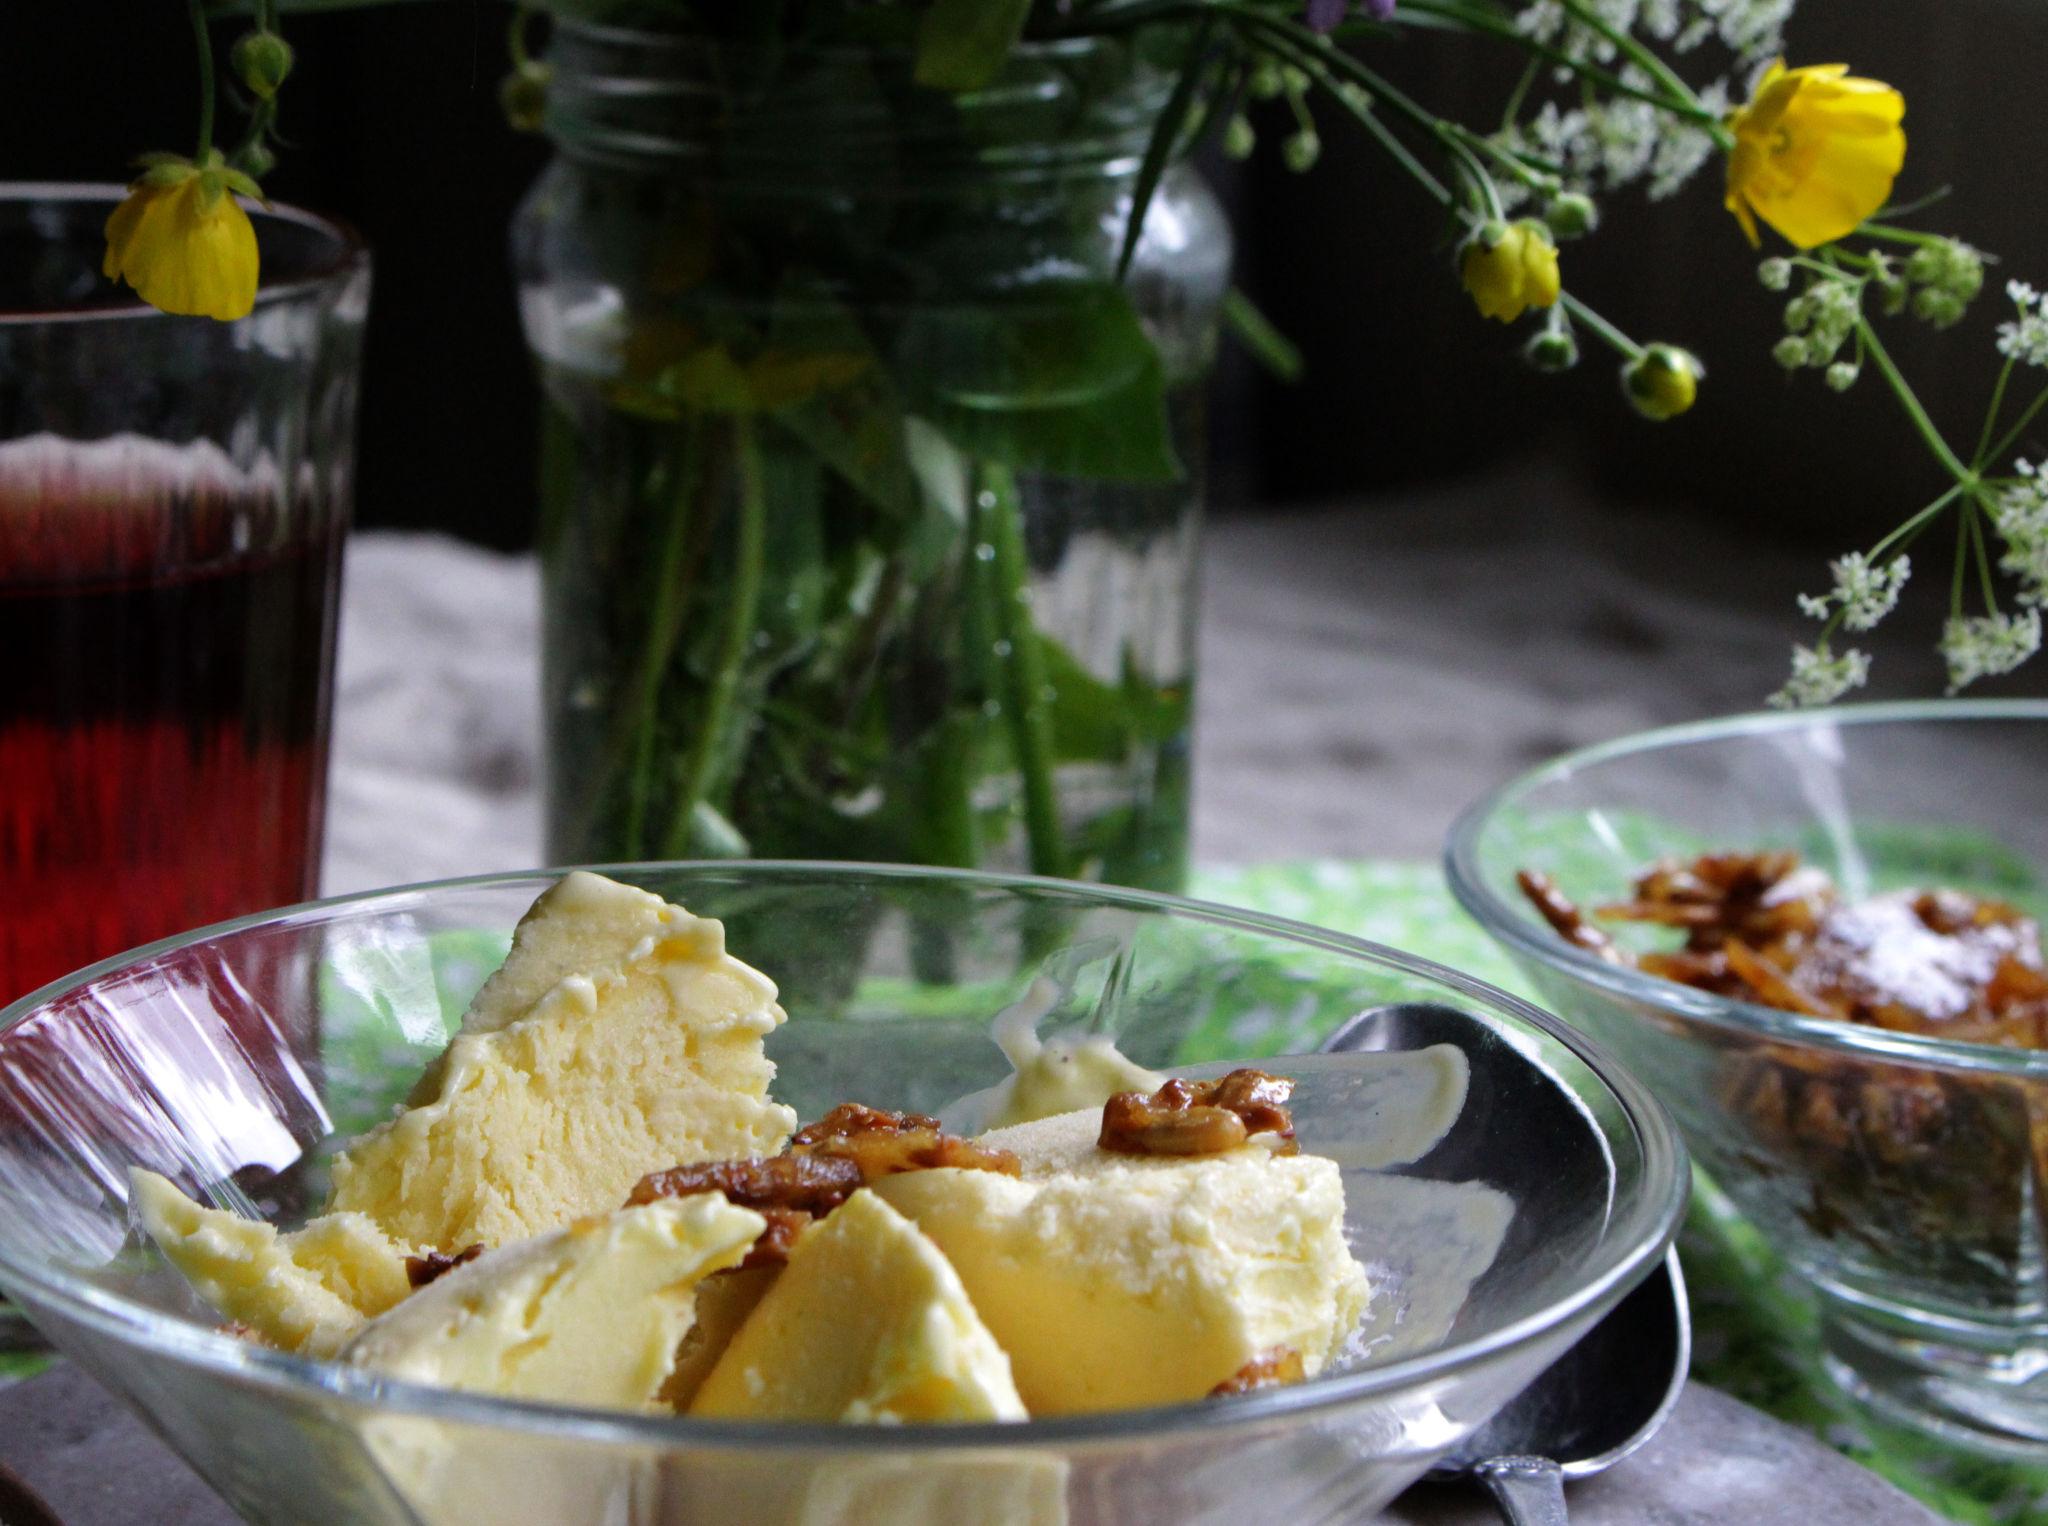 Foto: Kathrine Kragøe Skjelvan/Glutenogmelkefri.com